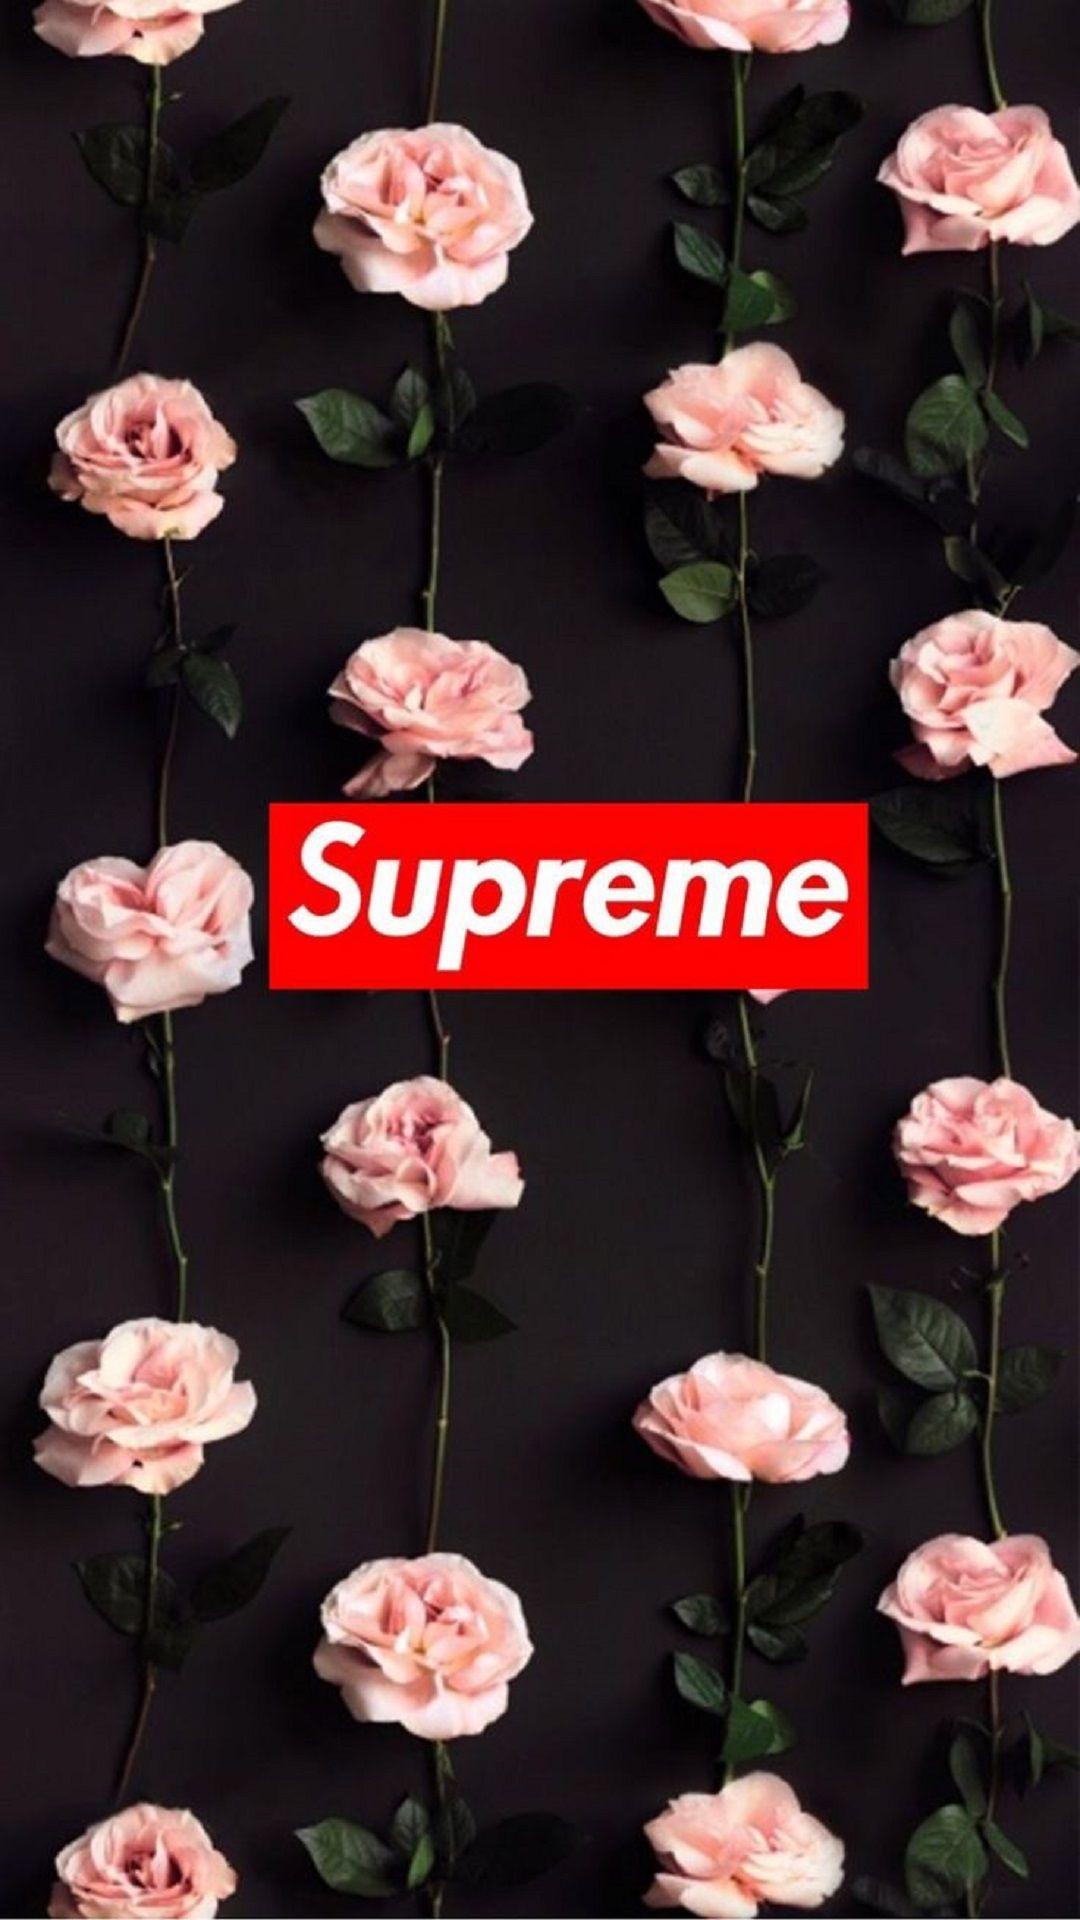 Supreme Rose Gold Wallpapers On Wallpaperdog